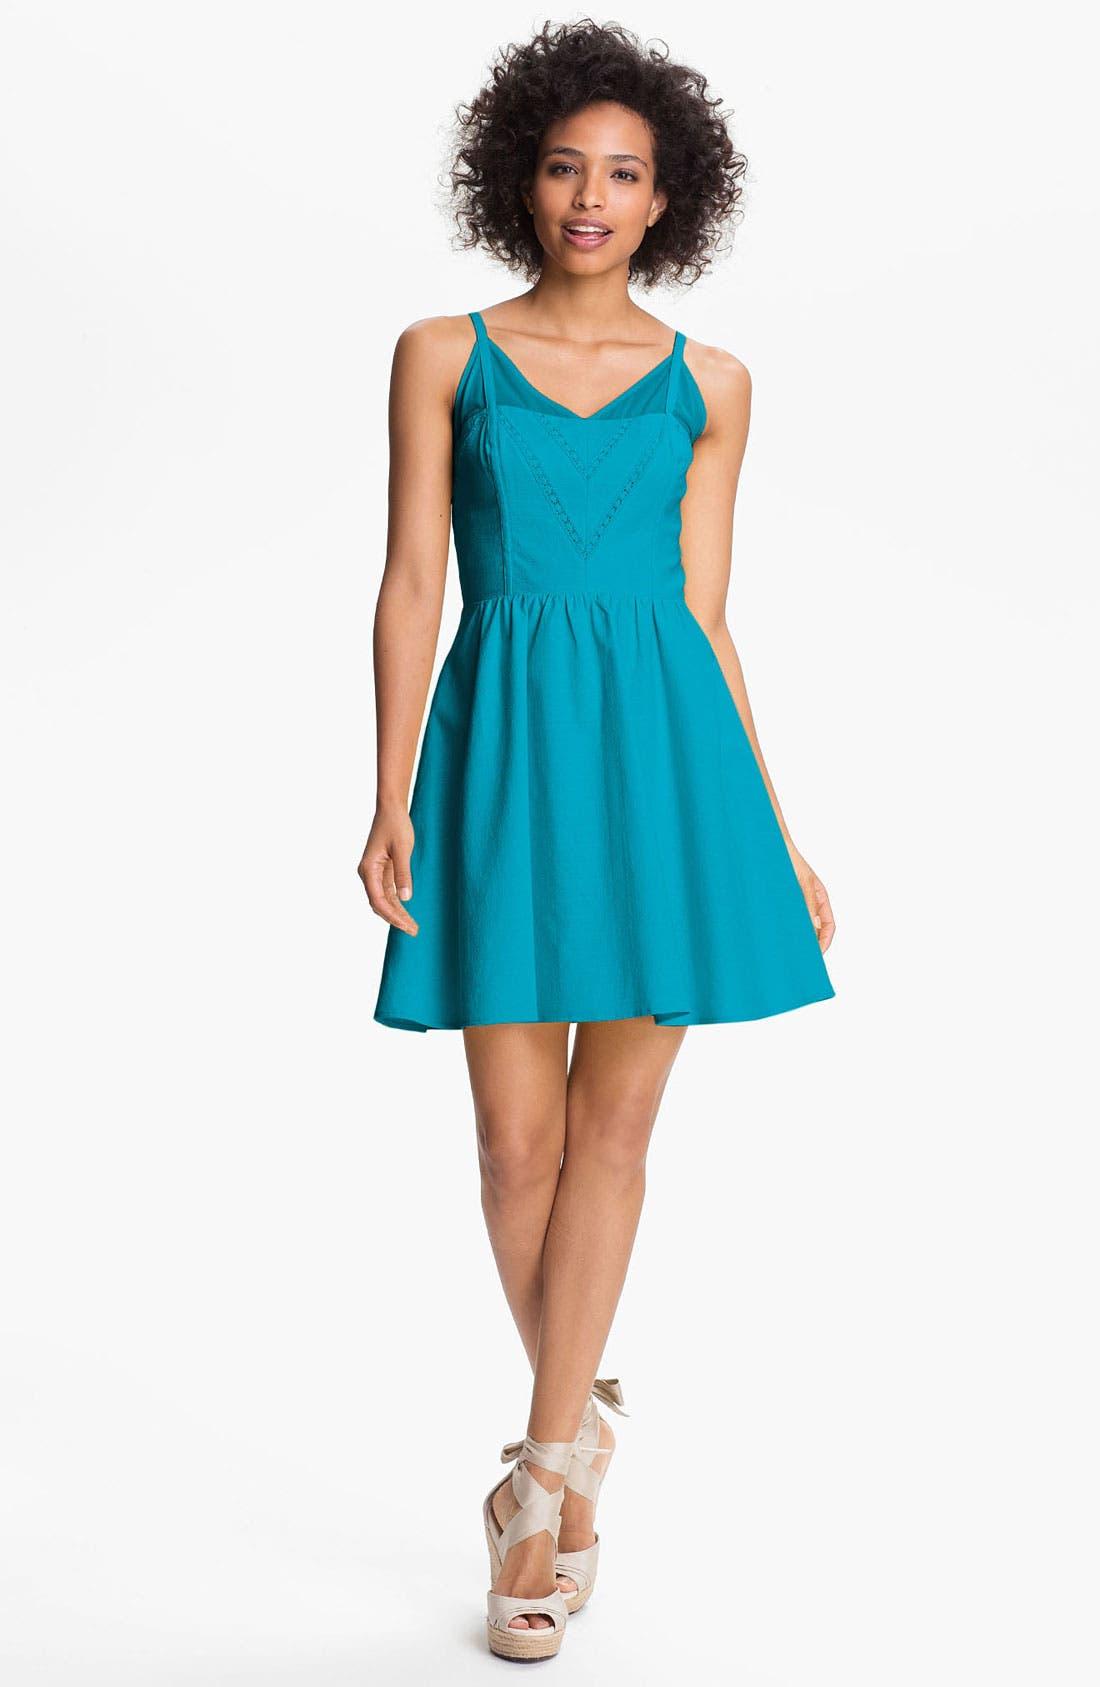 Alternate Image 1 Selected - Jessica Simpson V-Neck Fit & Flare Dress